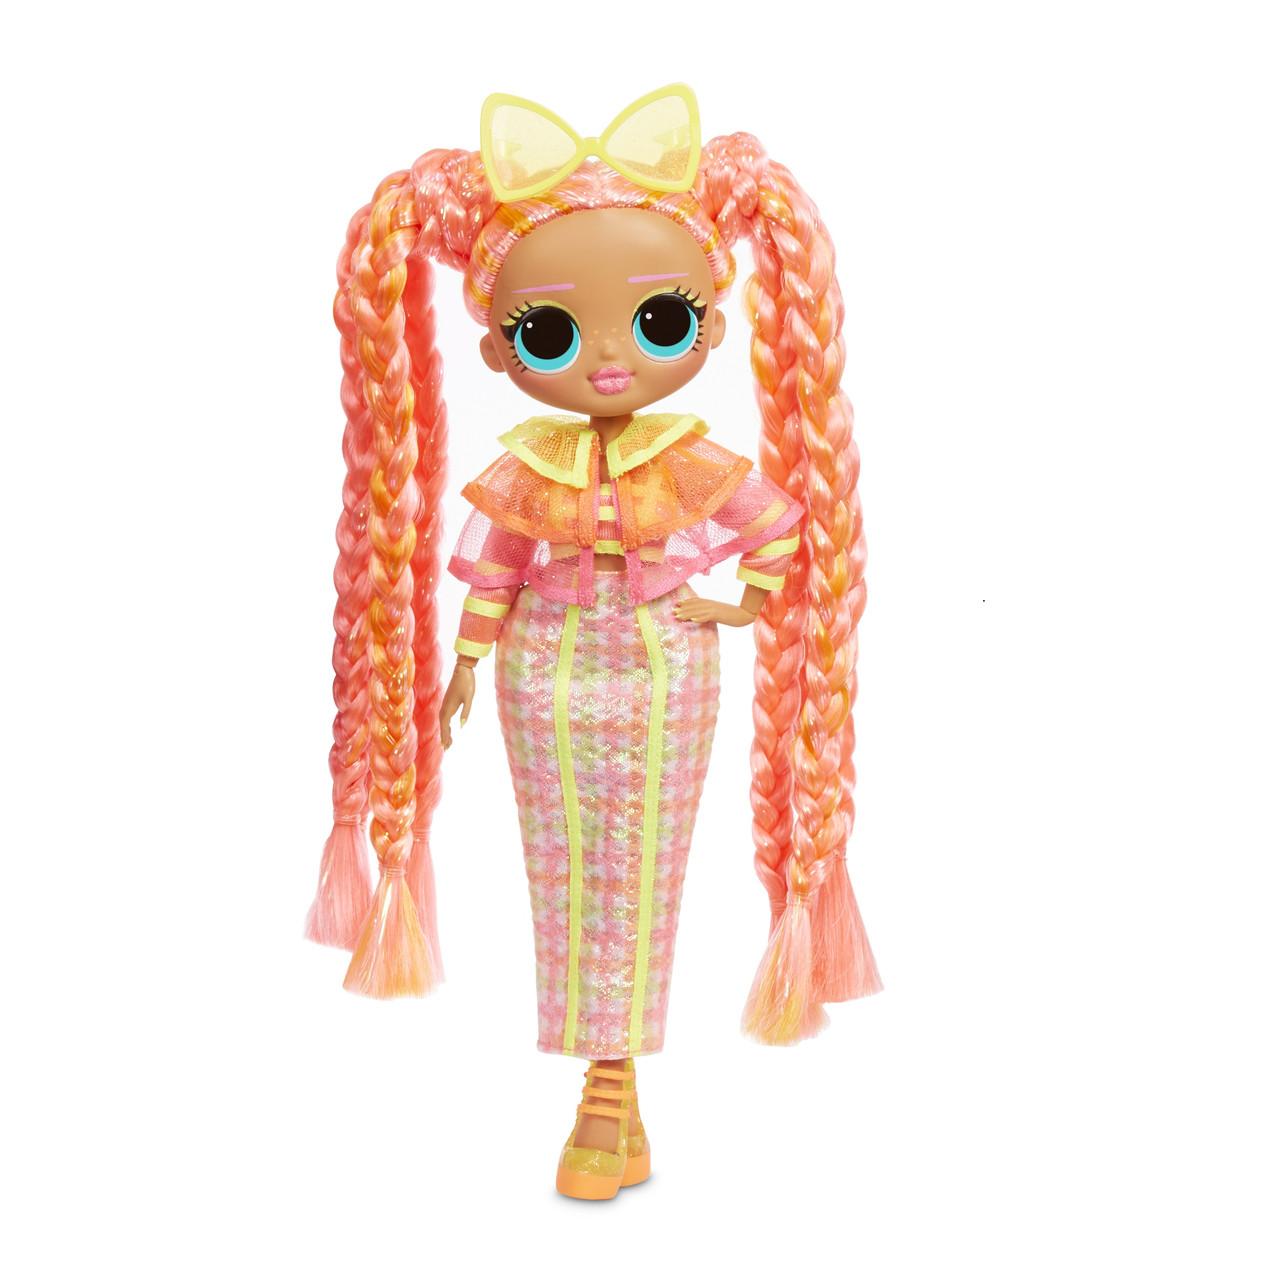 Кукла L.O.L. Surprise OMG Lights Dazzle - фото 2